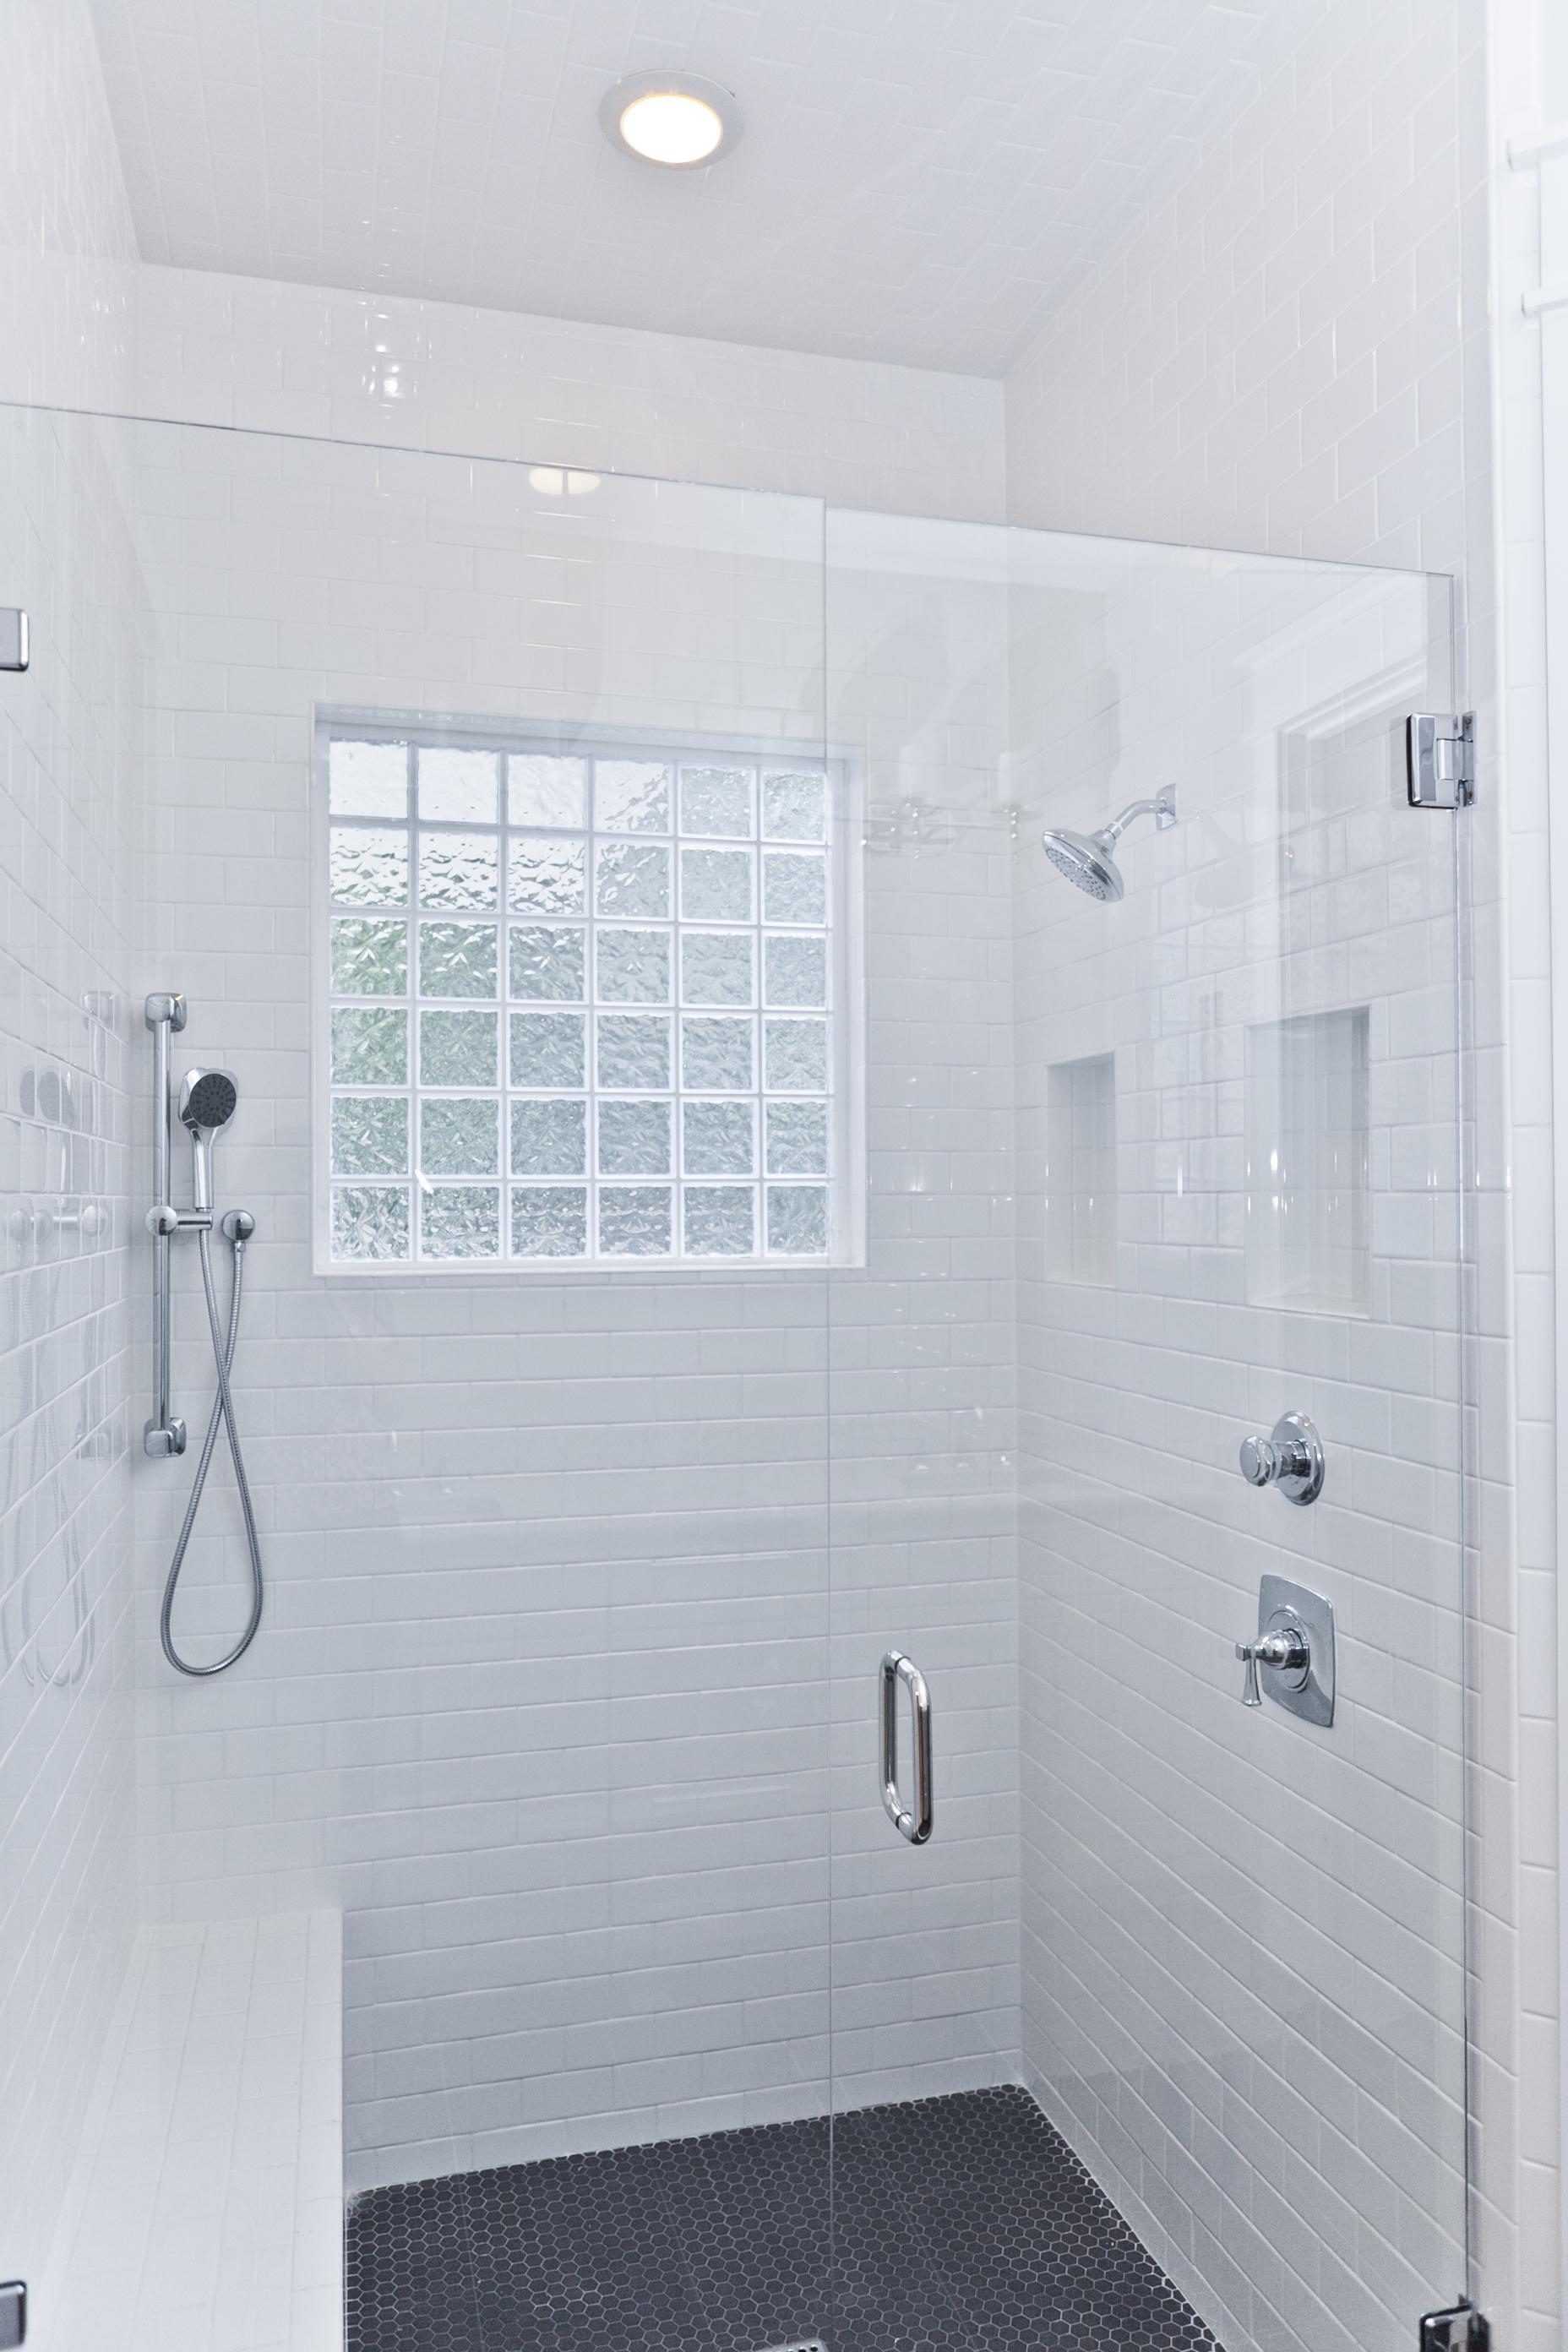 11 bath_up_shower.jpg